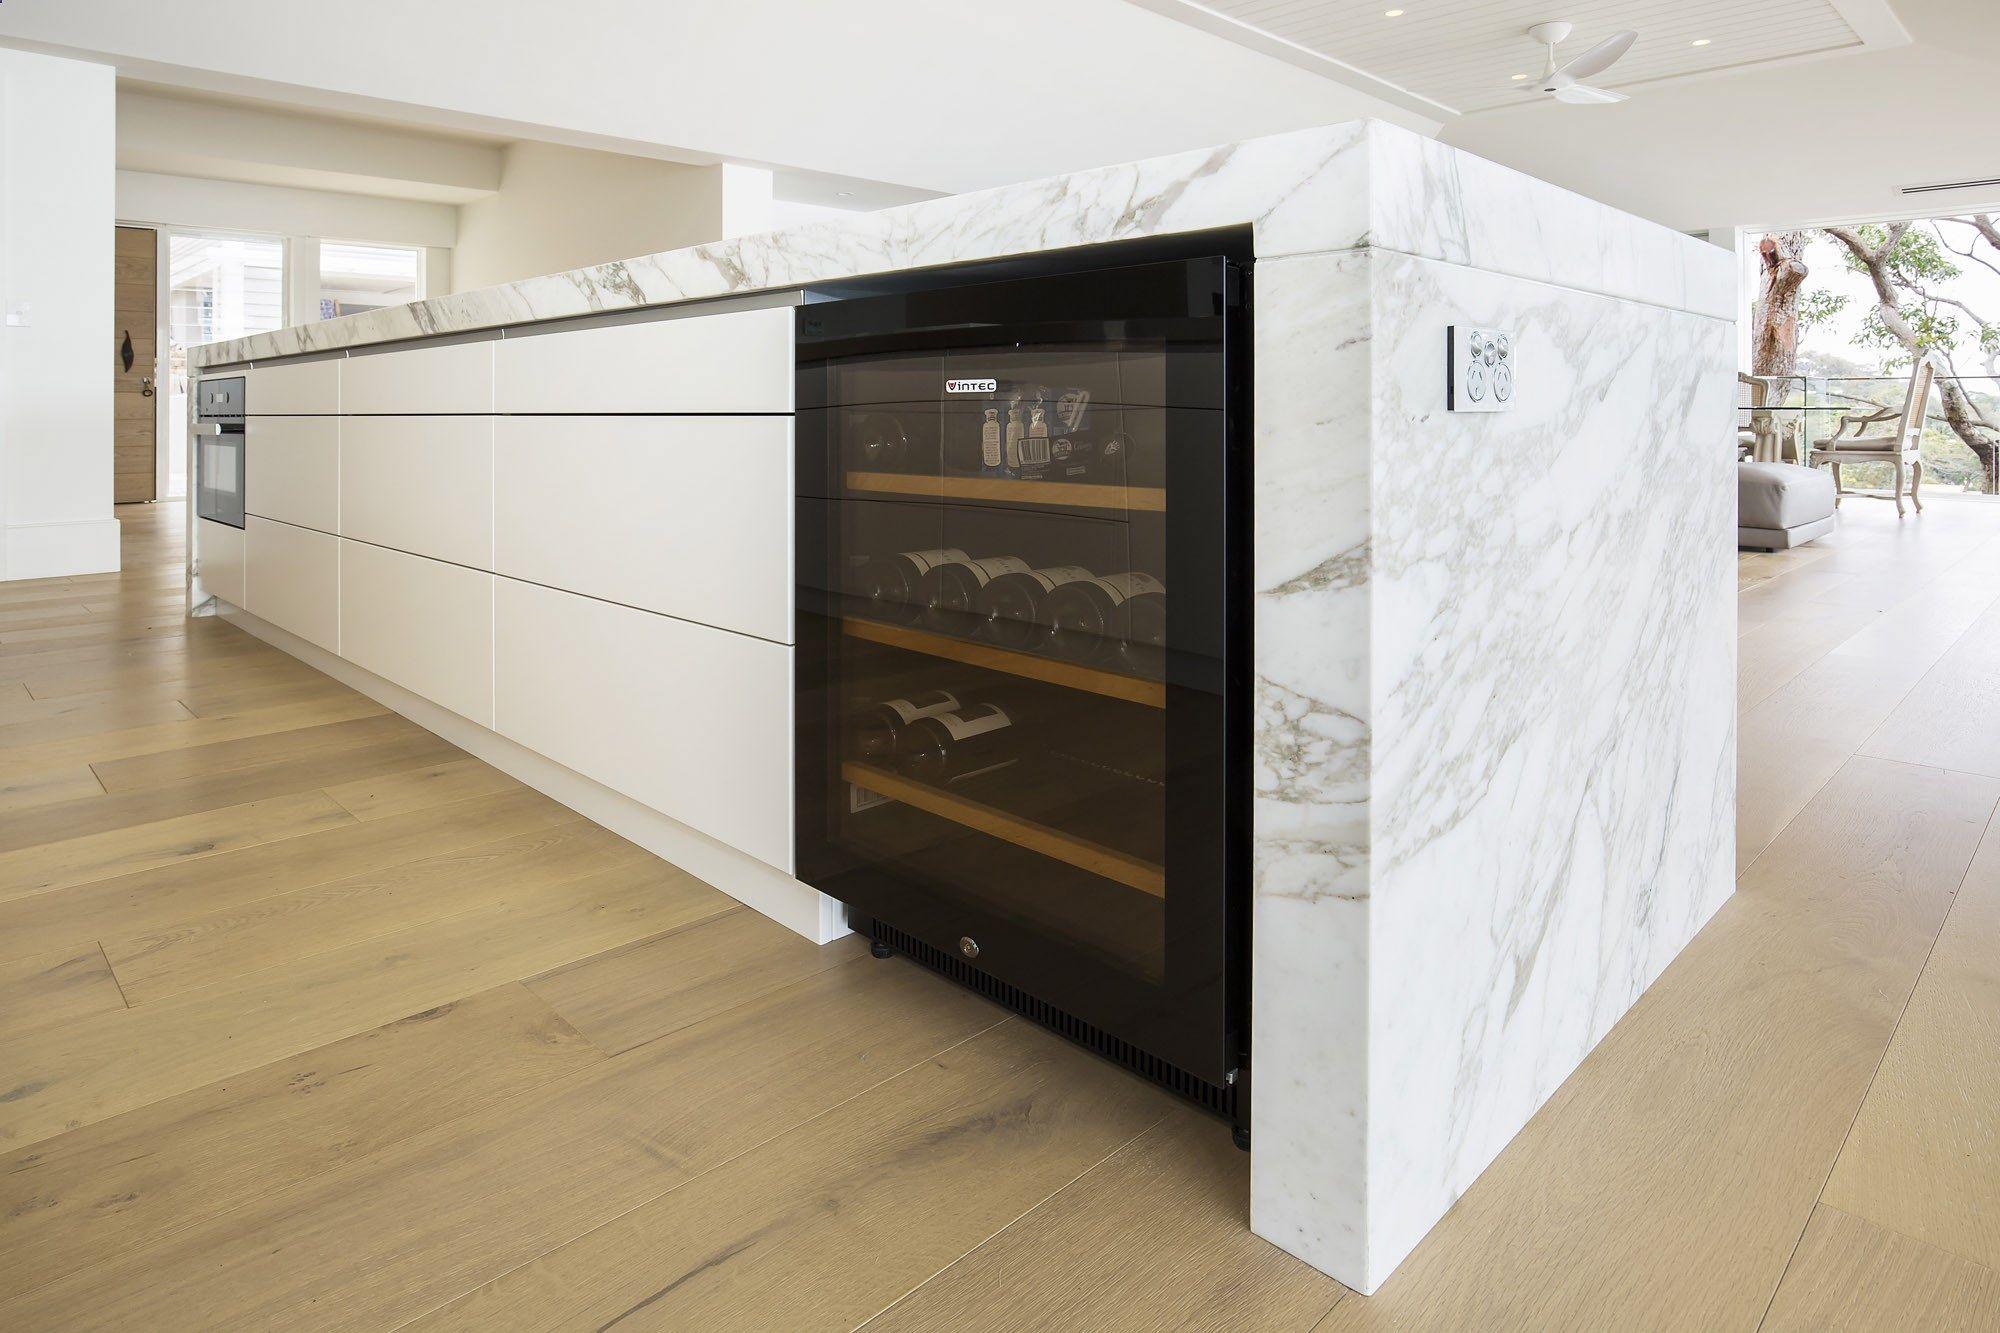 Vintec Wine fridge Luxury entertainers kitchen with striking